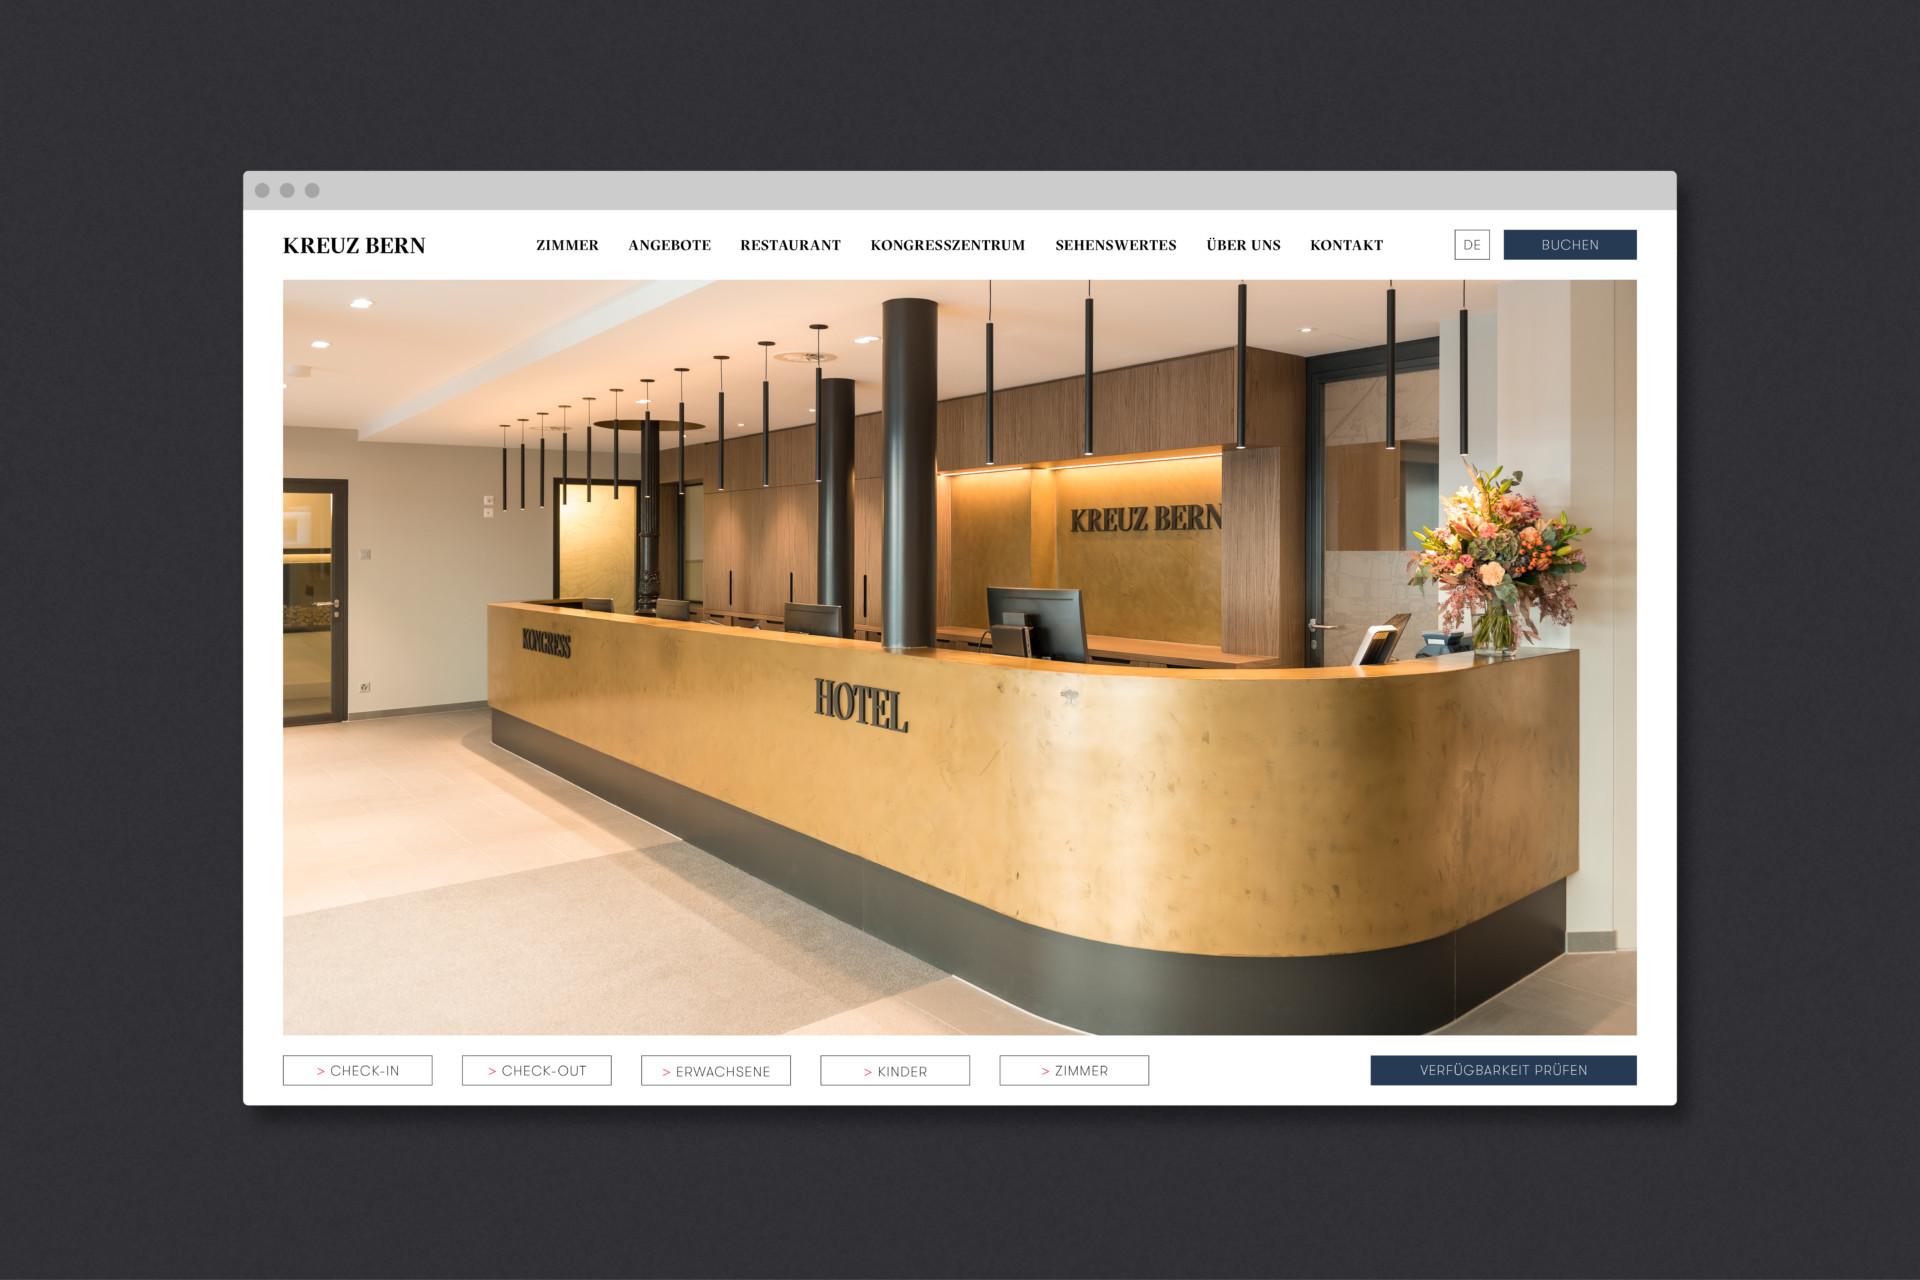 Steiner Grafik Corporate & Webdesign: Hotel Kreuz, Bern